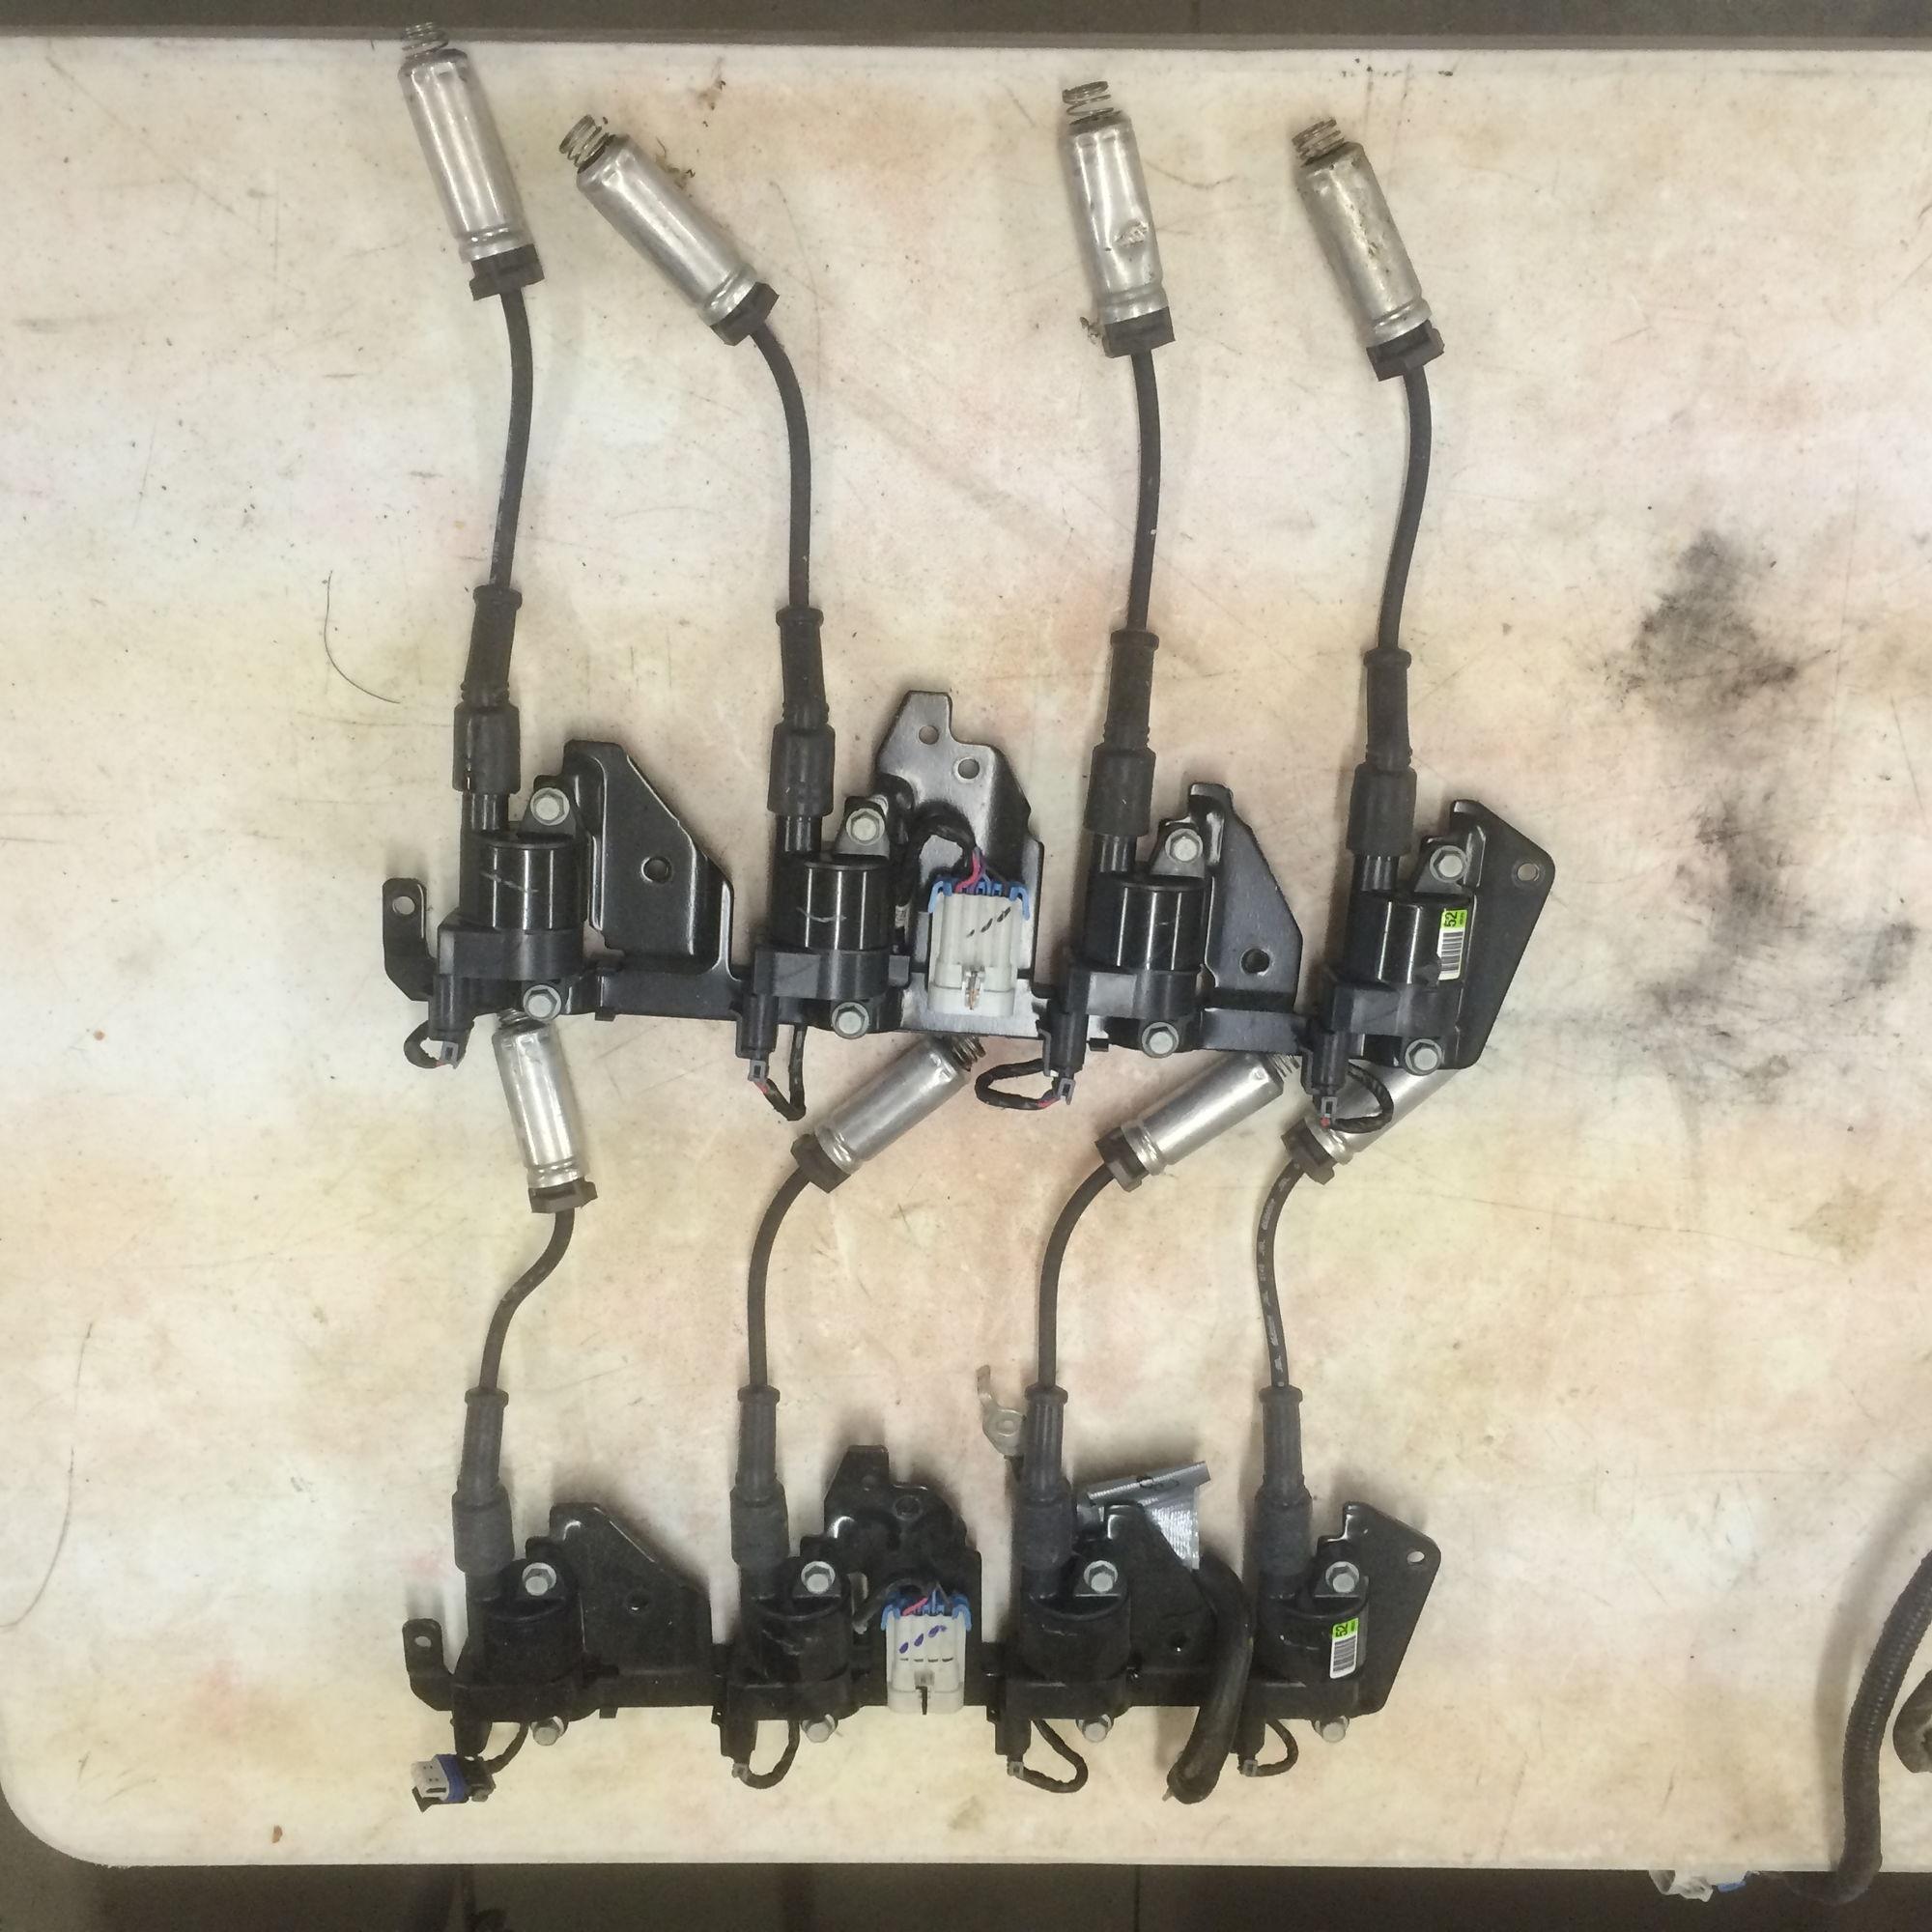 ls3 ecu wiring loom coil packs and dbw throttle ls1tech. Black Bedroom Furniture Sets. Home Design Ideas